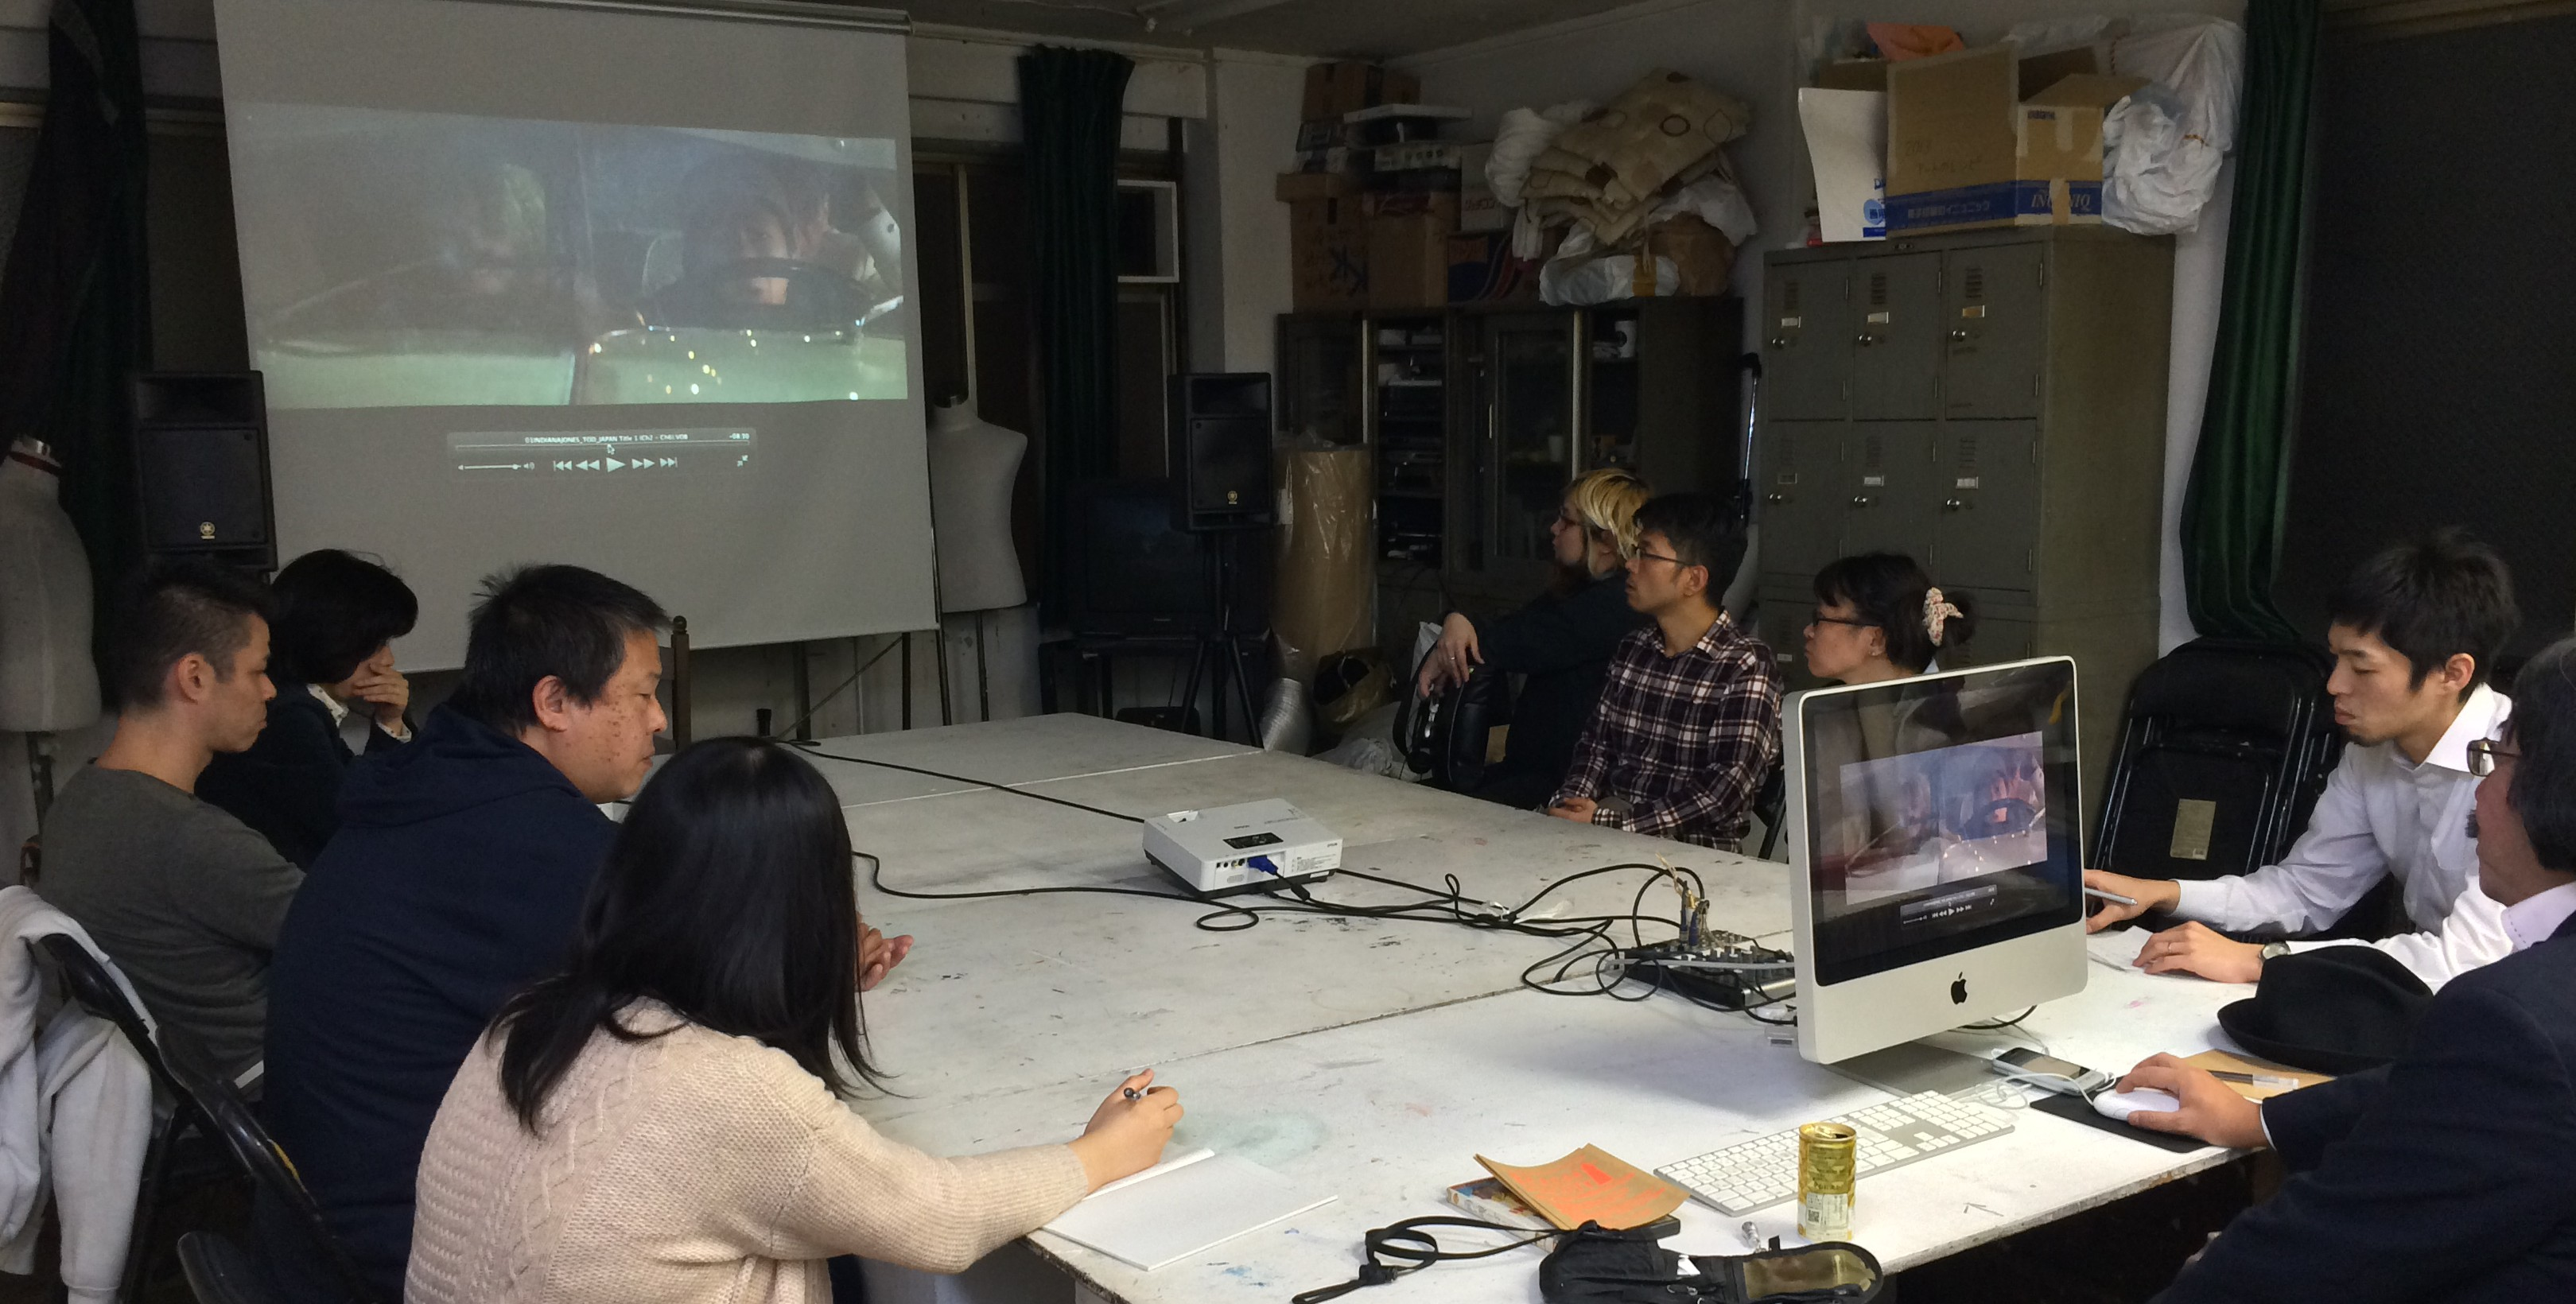 2013-10-31 19.51.29 HDR_映画音楽